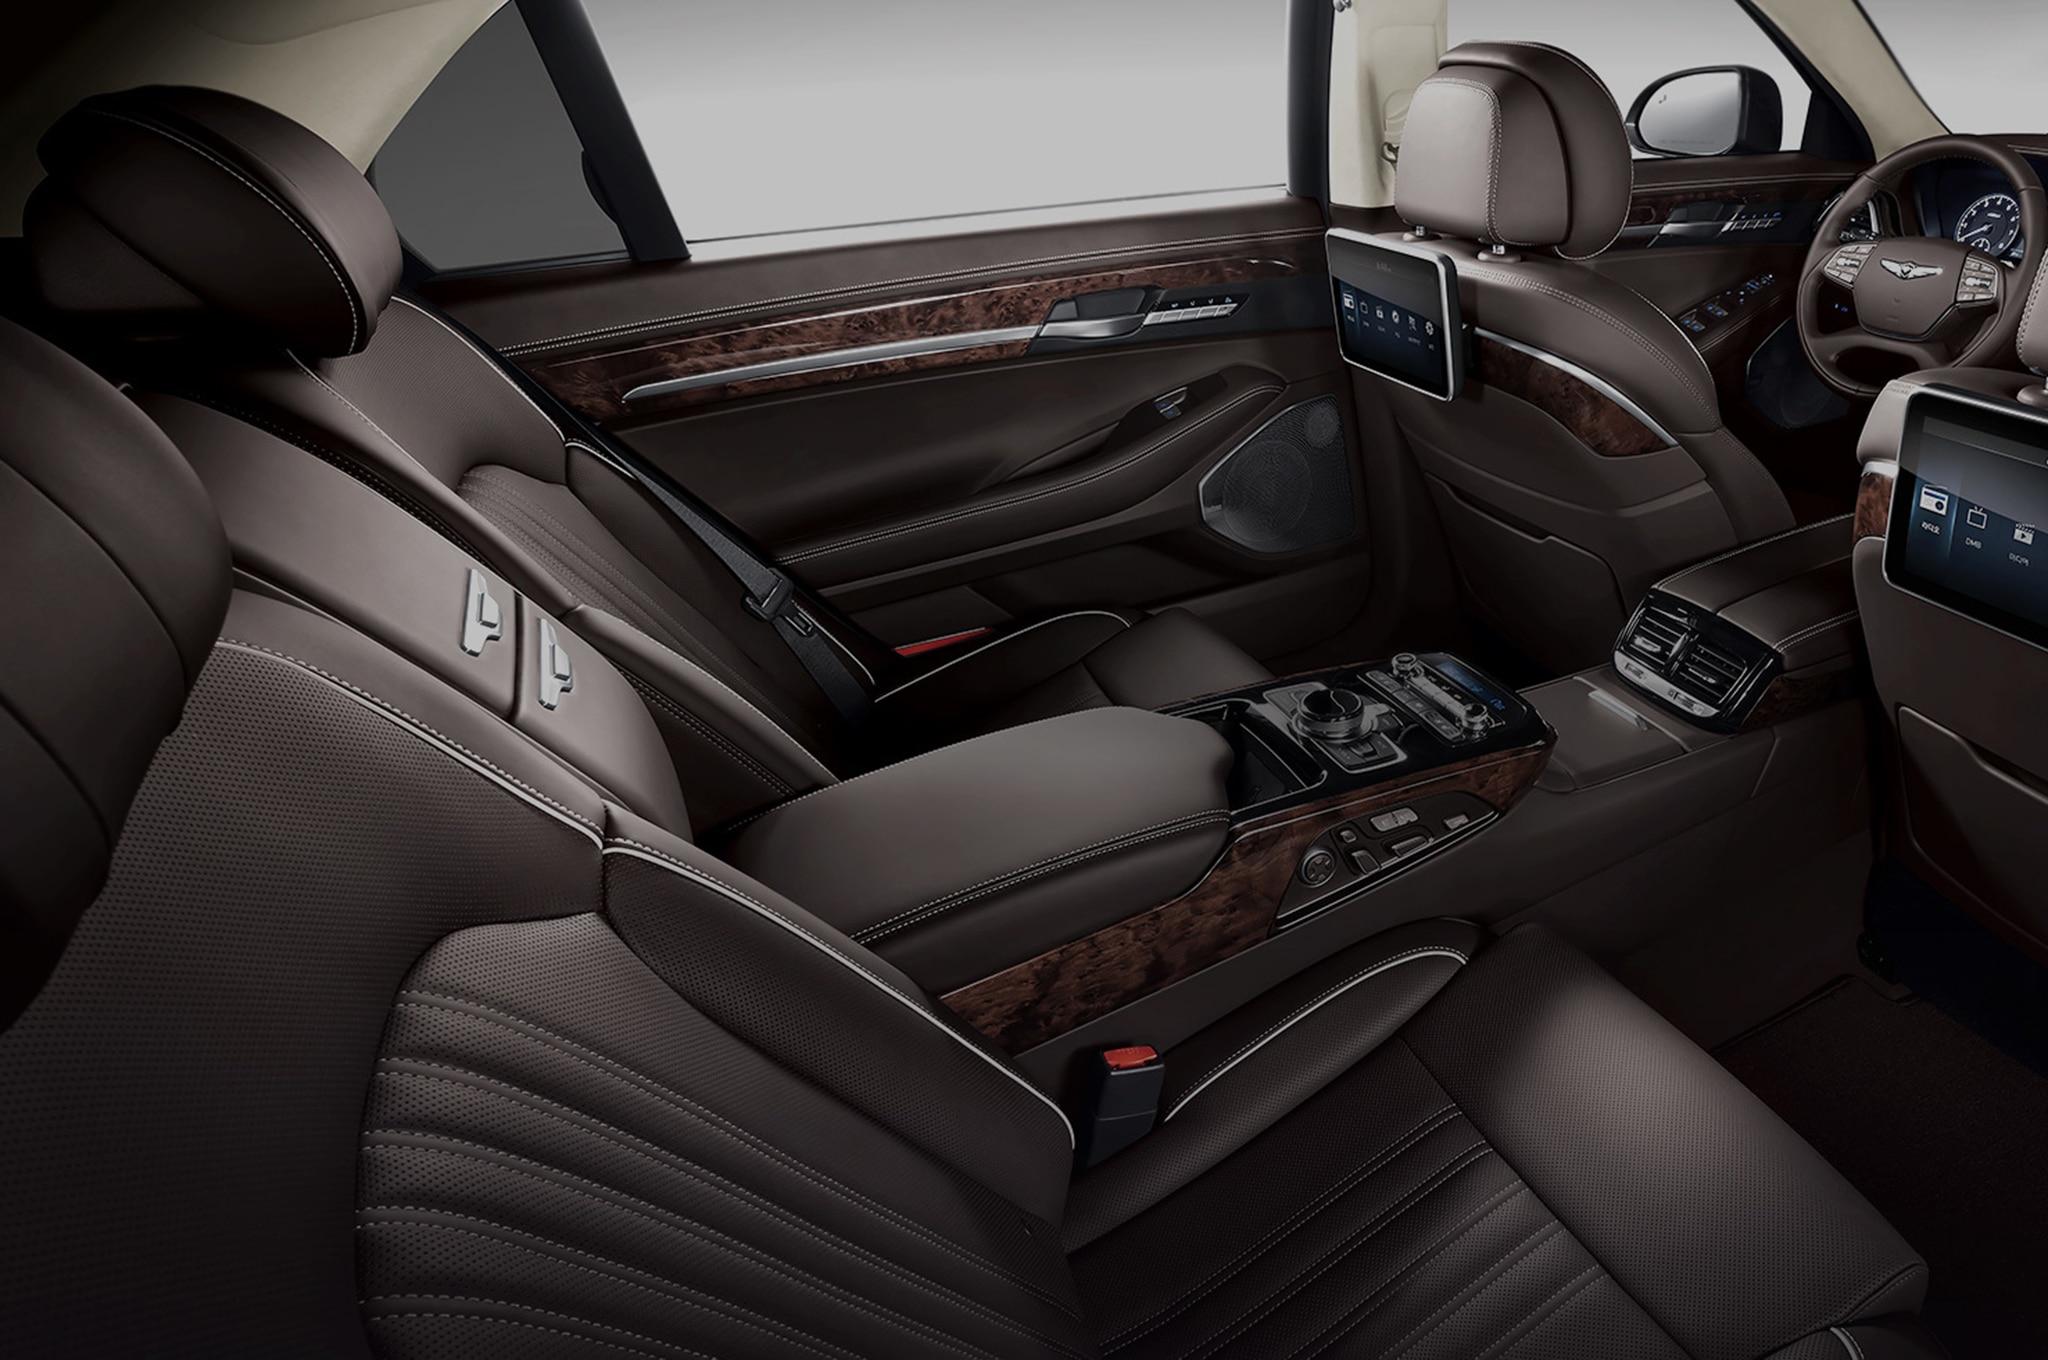 2017 Genesis G90 Luxury Sedan Revealed To Take On S Class